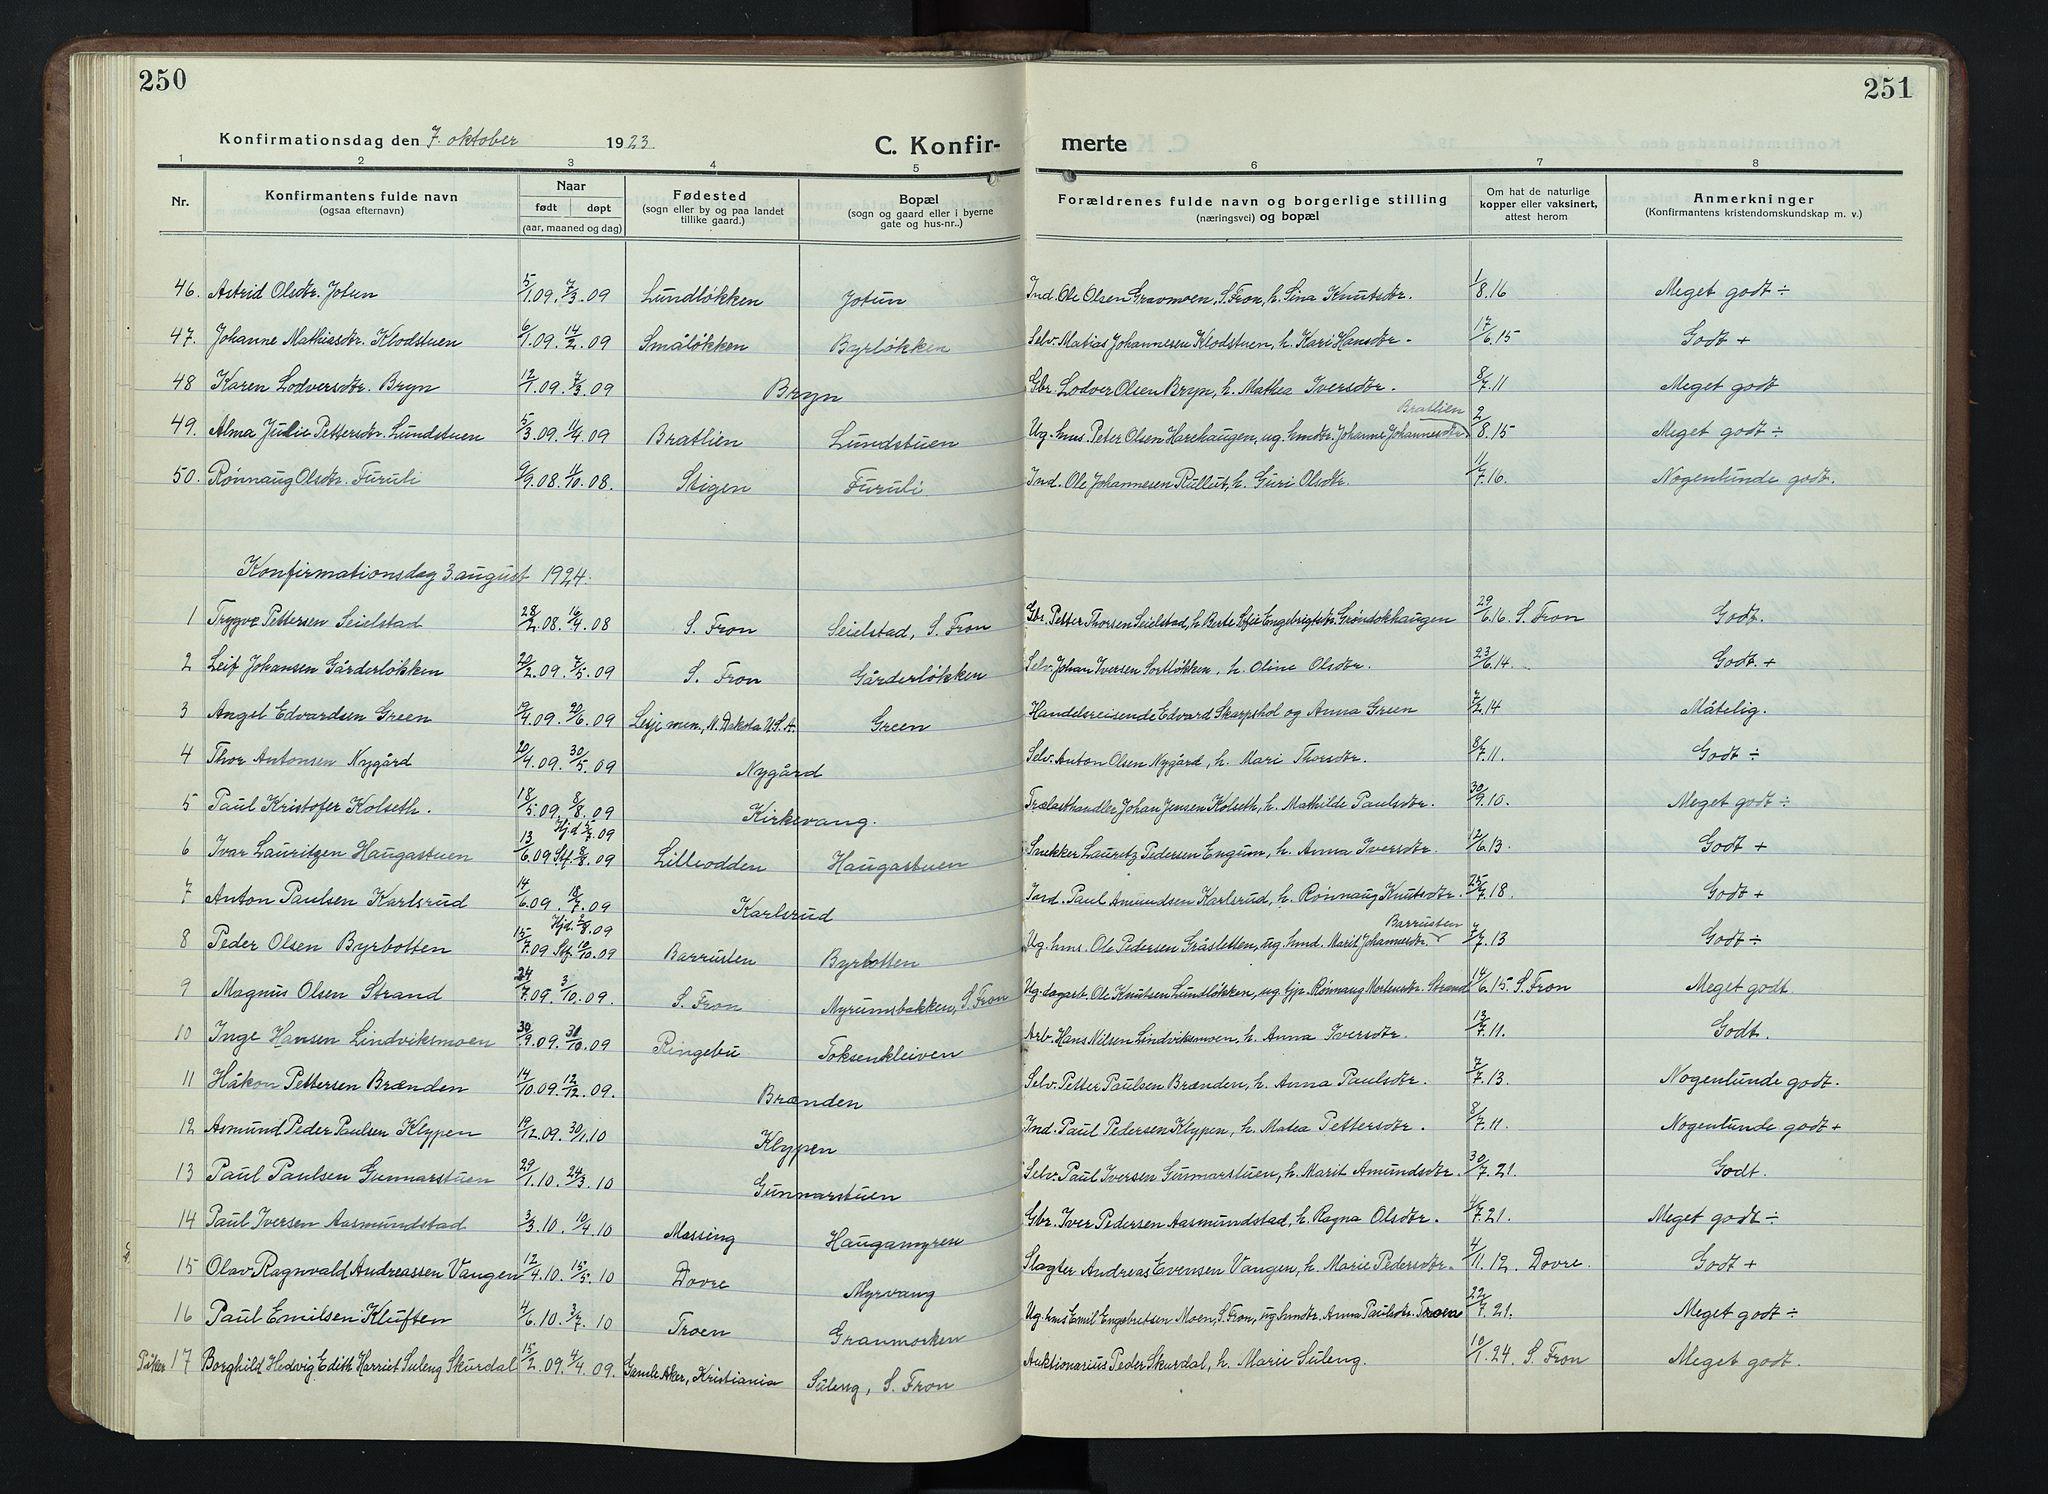 SAH, Nord-Fron prestekontor, Klokkerbok nr. 7, 1915-1946, s. 250-251